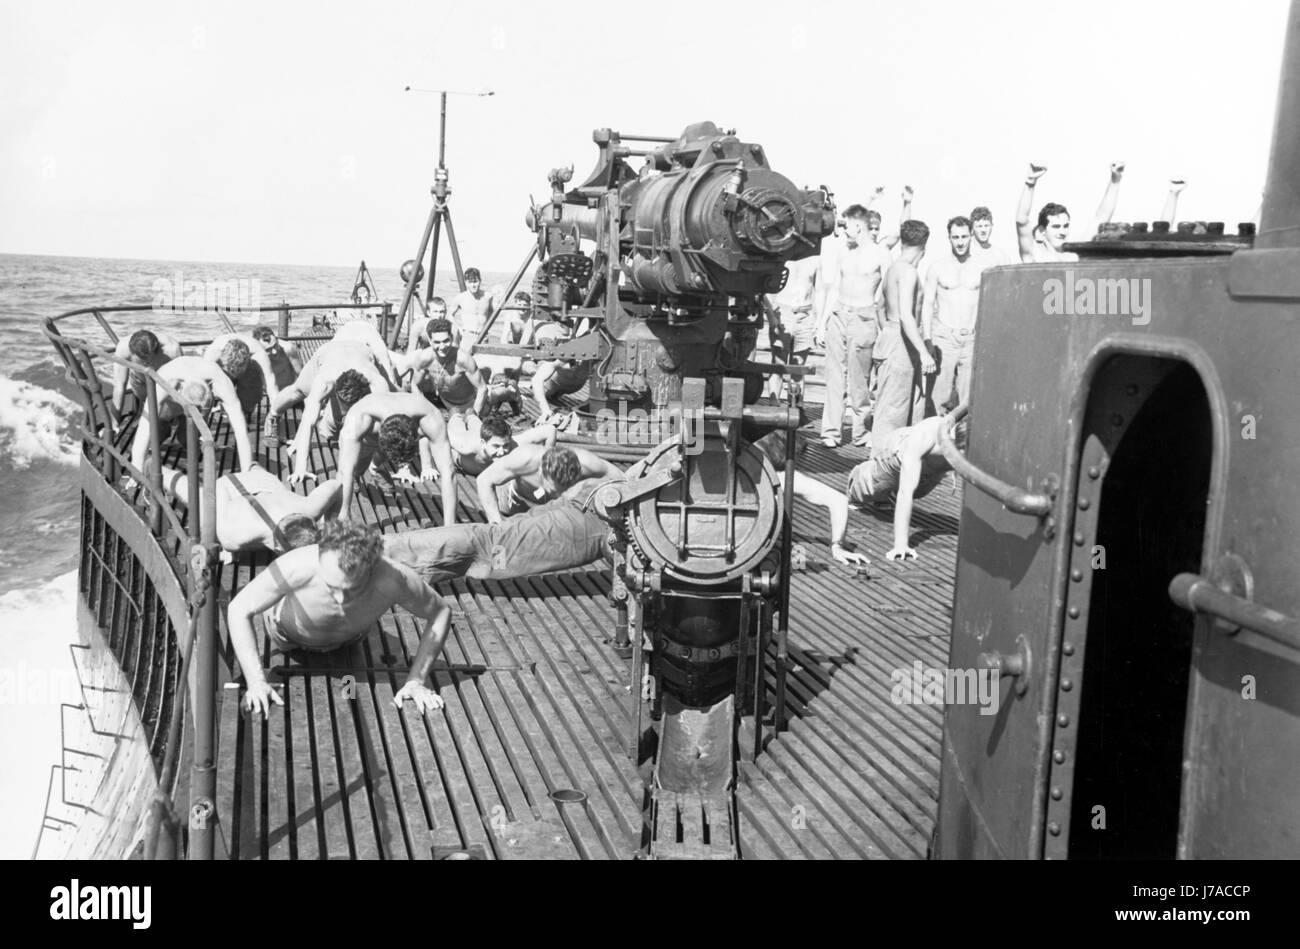 U.S. Marine Raiders exercise on the deck of USS Nautilus, 1942. - Stock Image